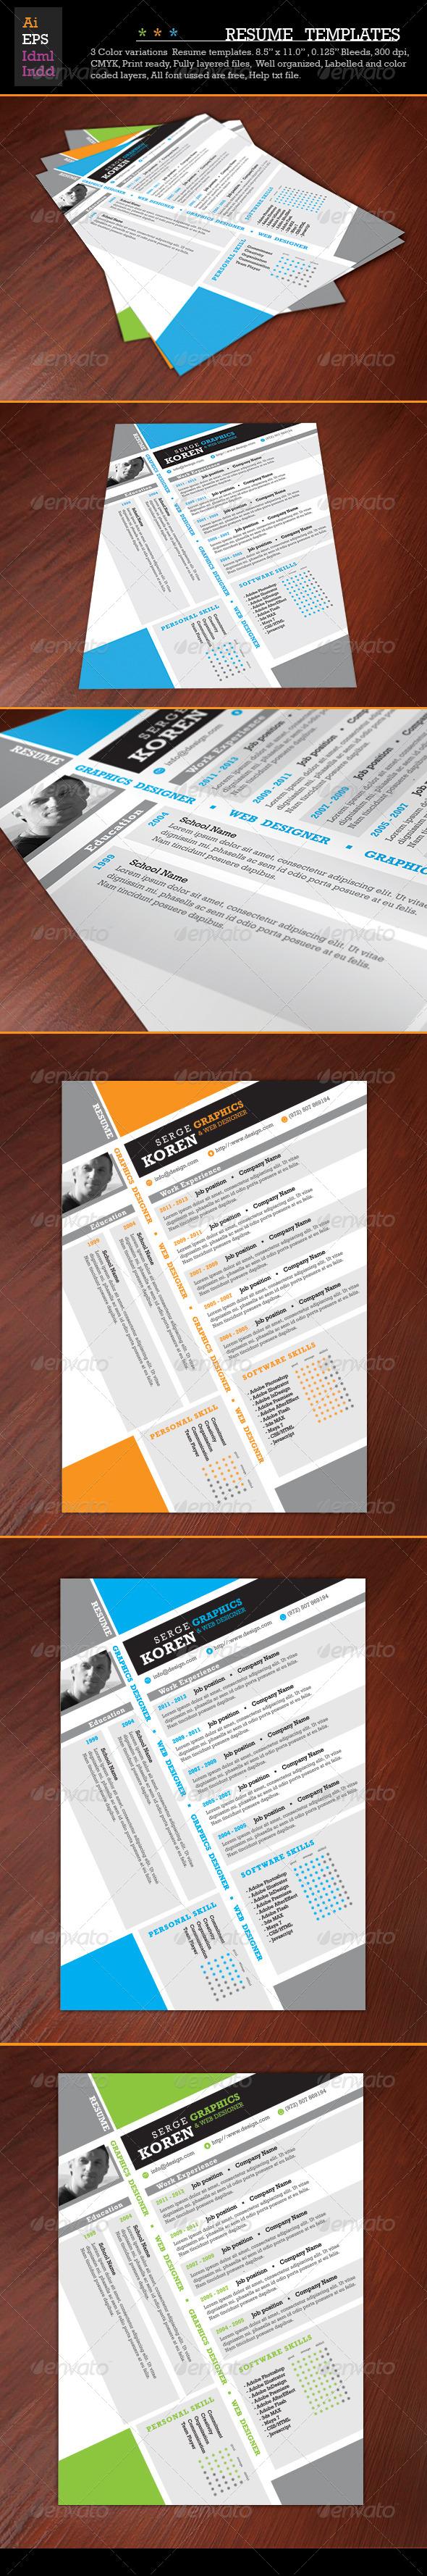 GraphicRiver Resume Template 5422628